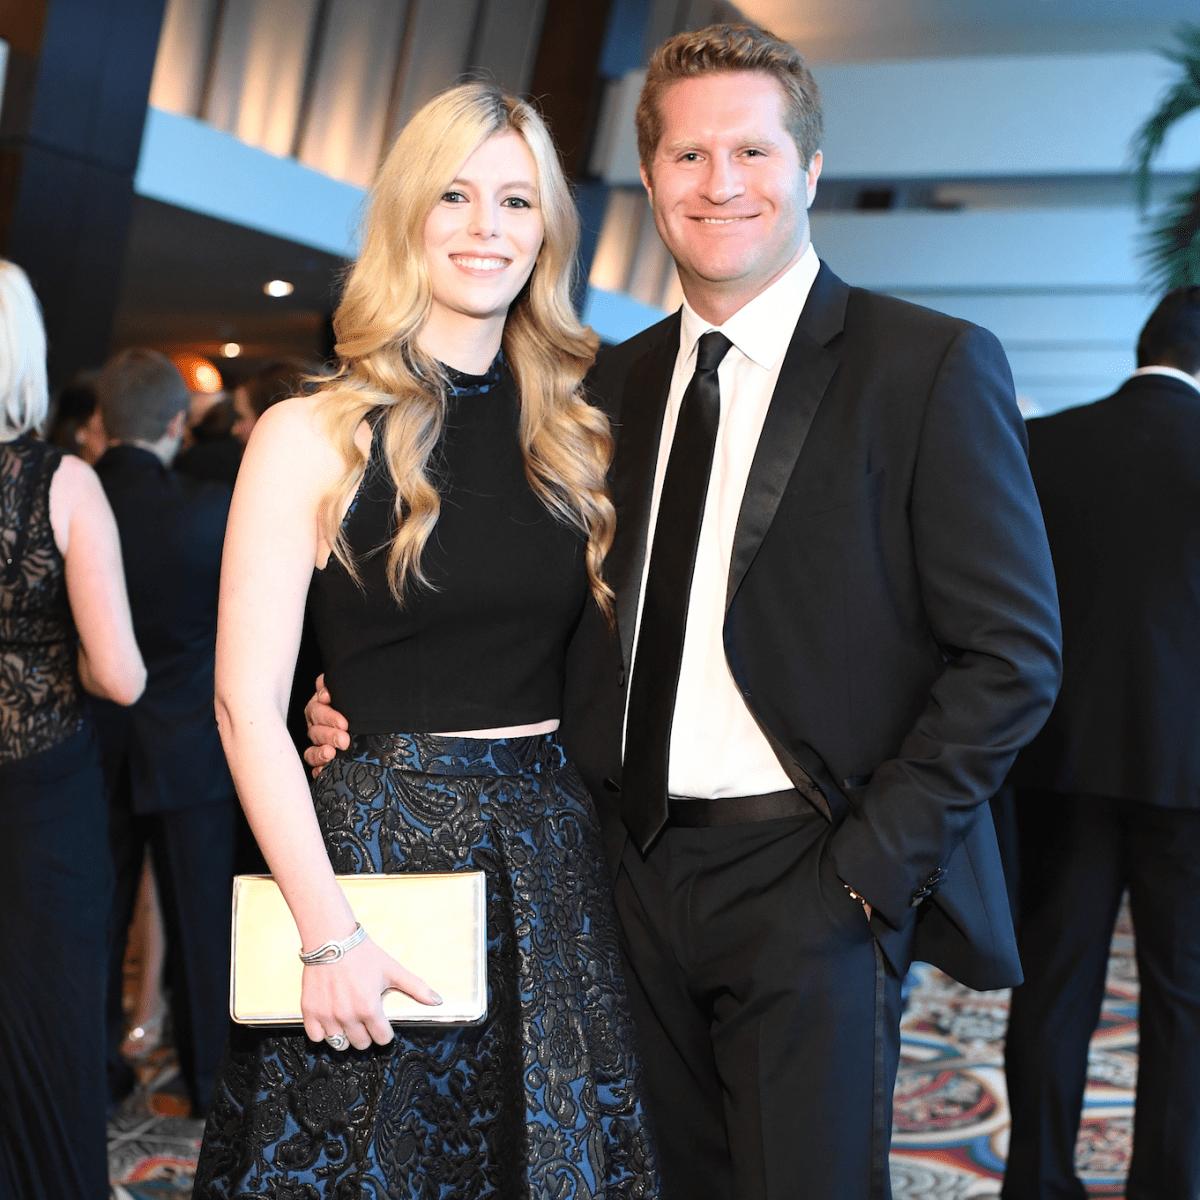 Kimberly Falgout, Evan Scheele at Memorial Hermann Gala